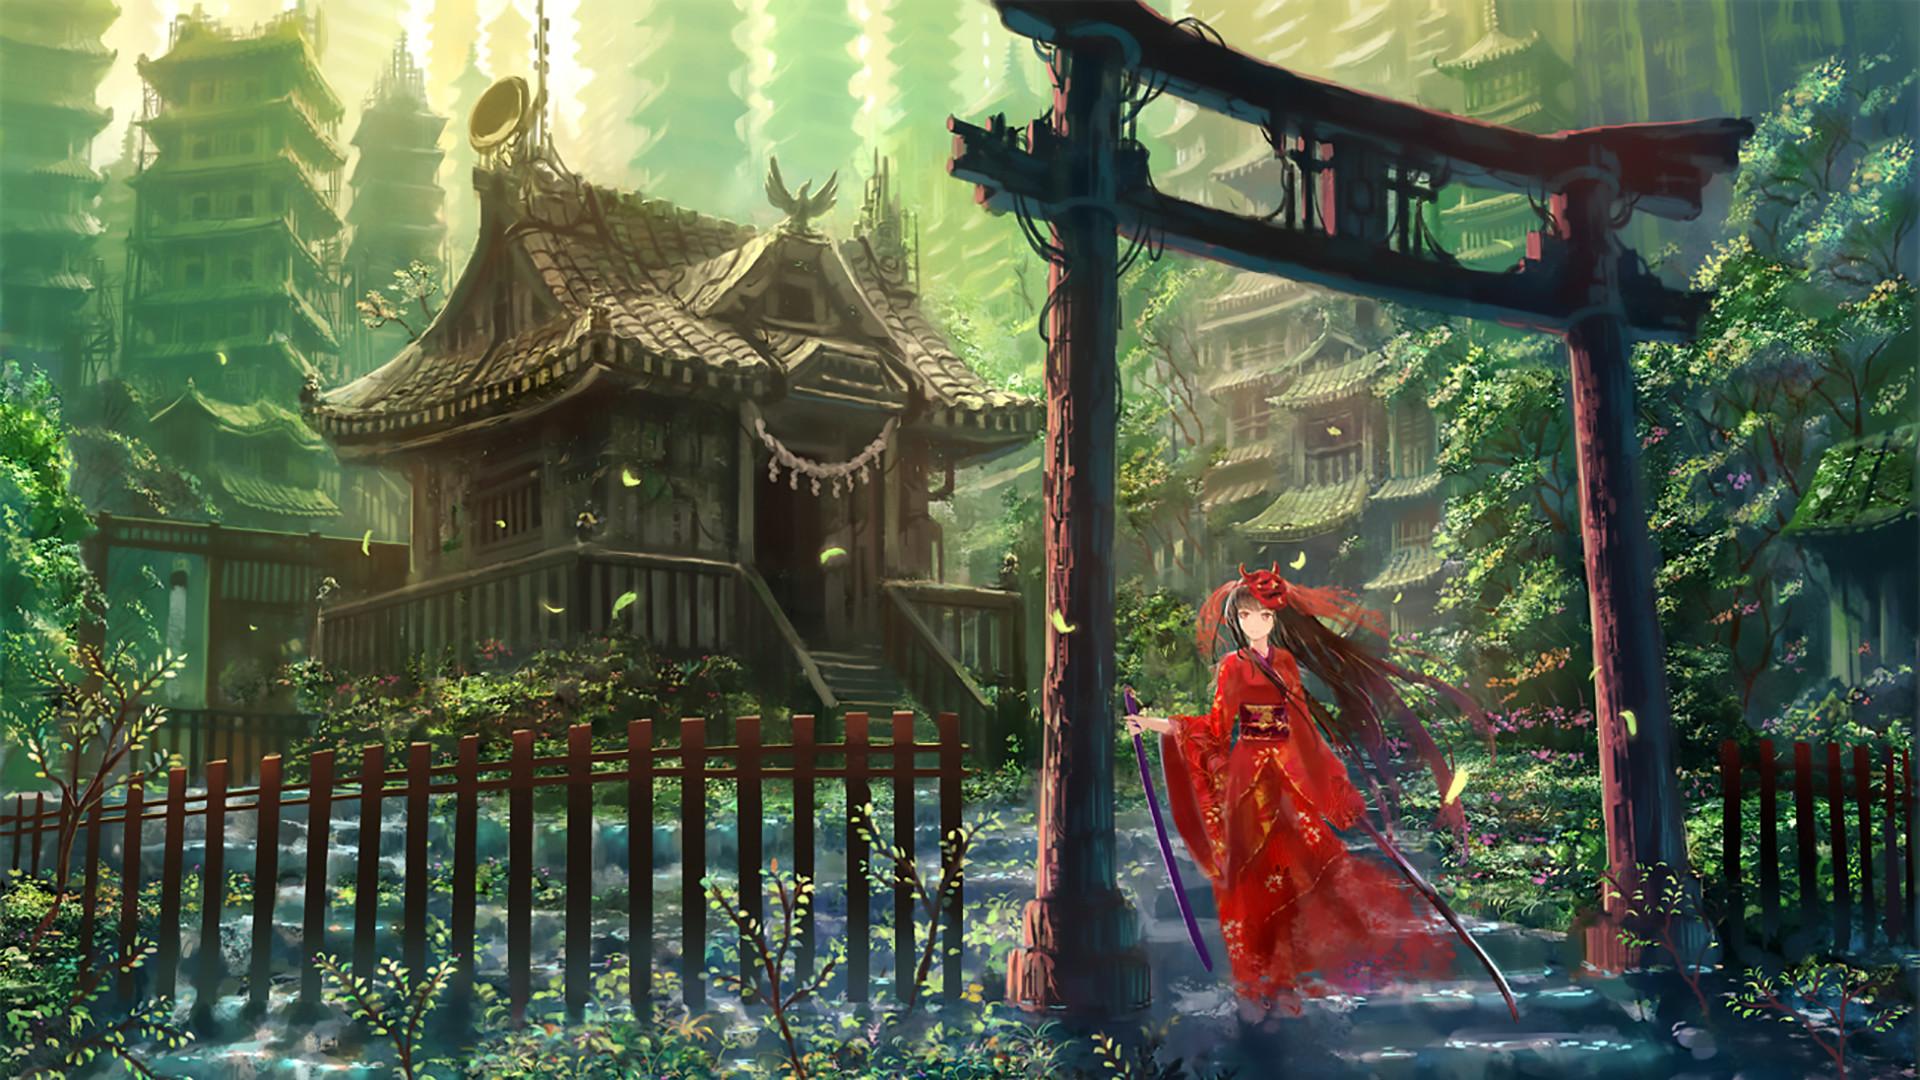 Anime – Original Woman Pretty Japanese Clothes Scenic Weapon Katana Long  Hair Hinomoto Oniko Wallpaper